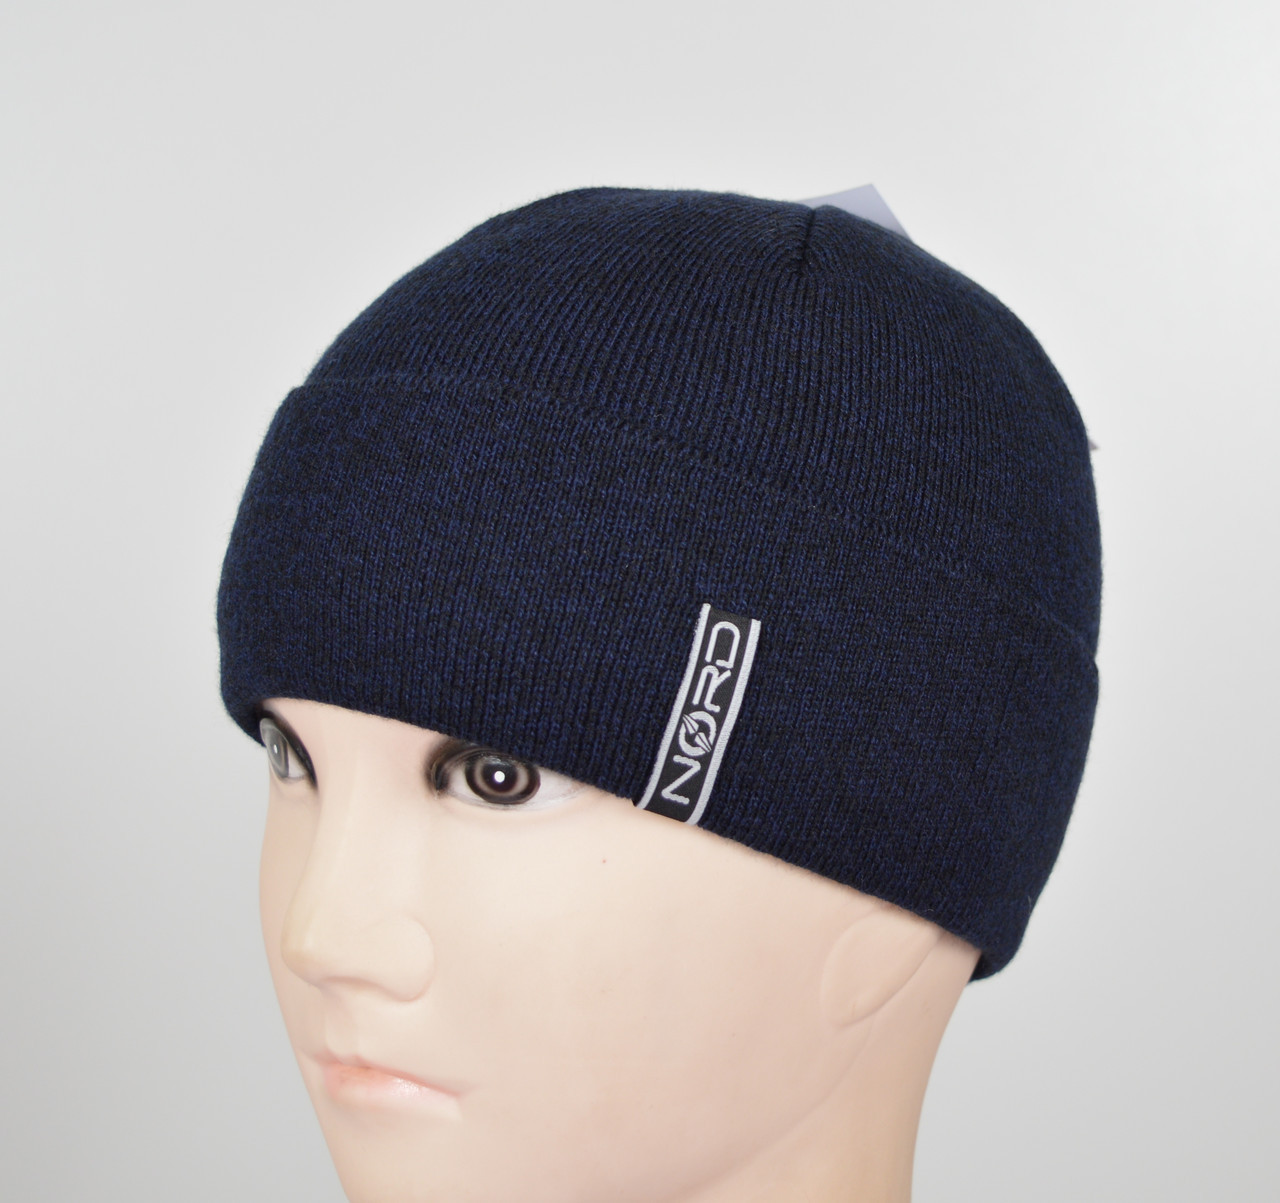 Мужская шапка Nord S-1802 синий